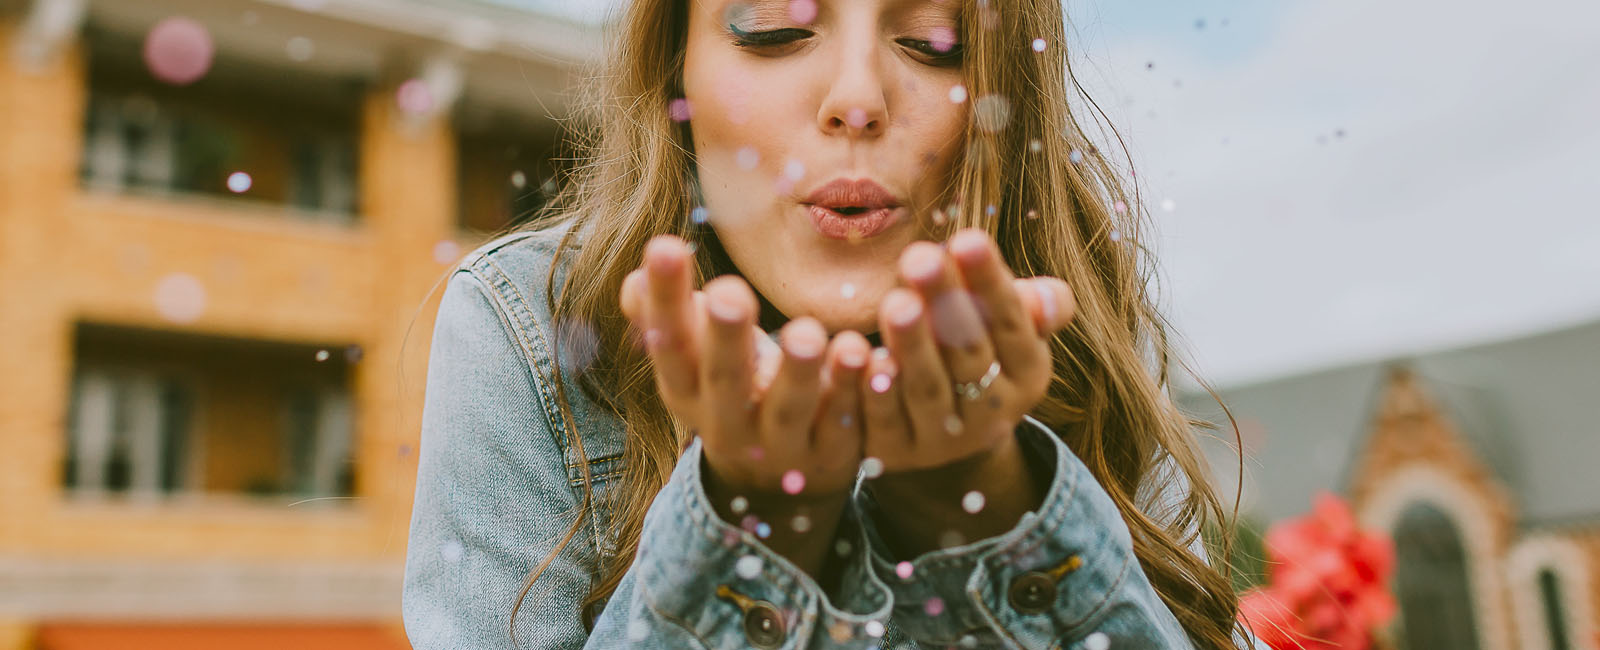 senior high school girl blowing glitter from her hands